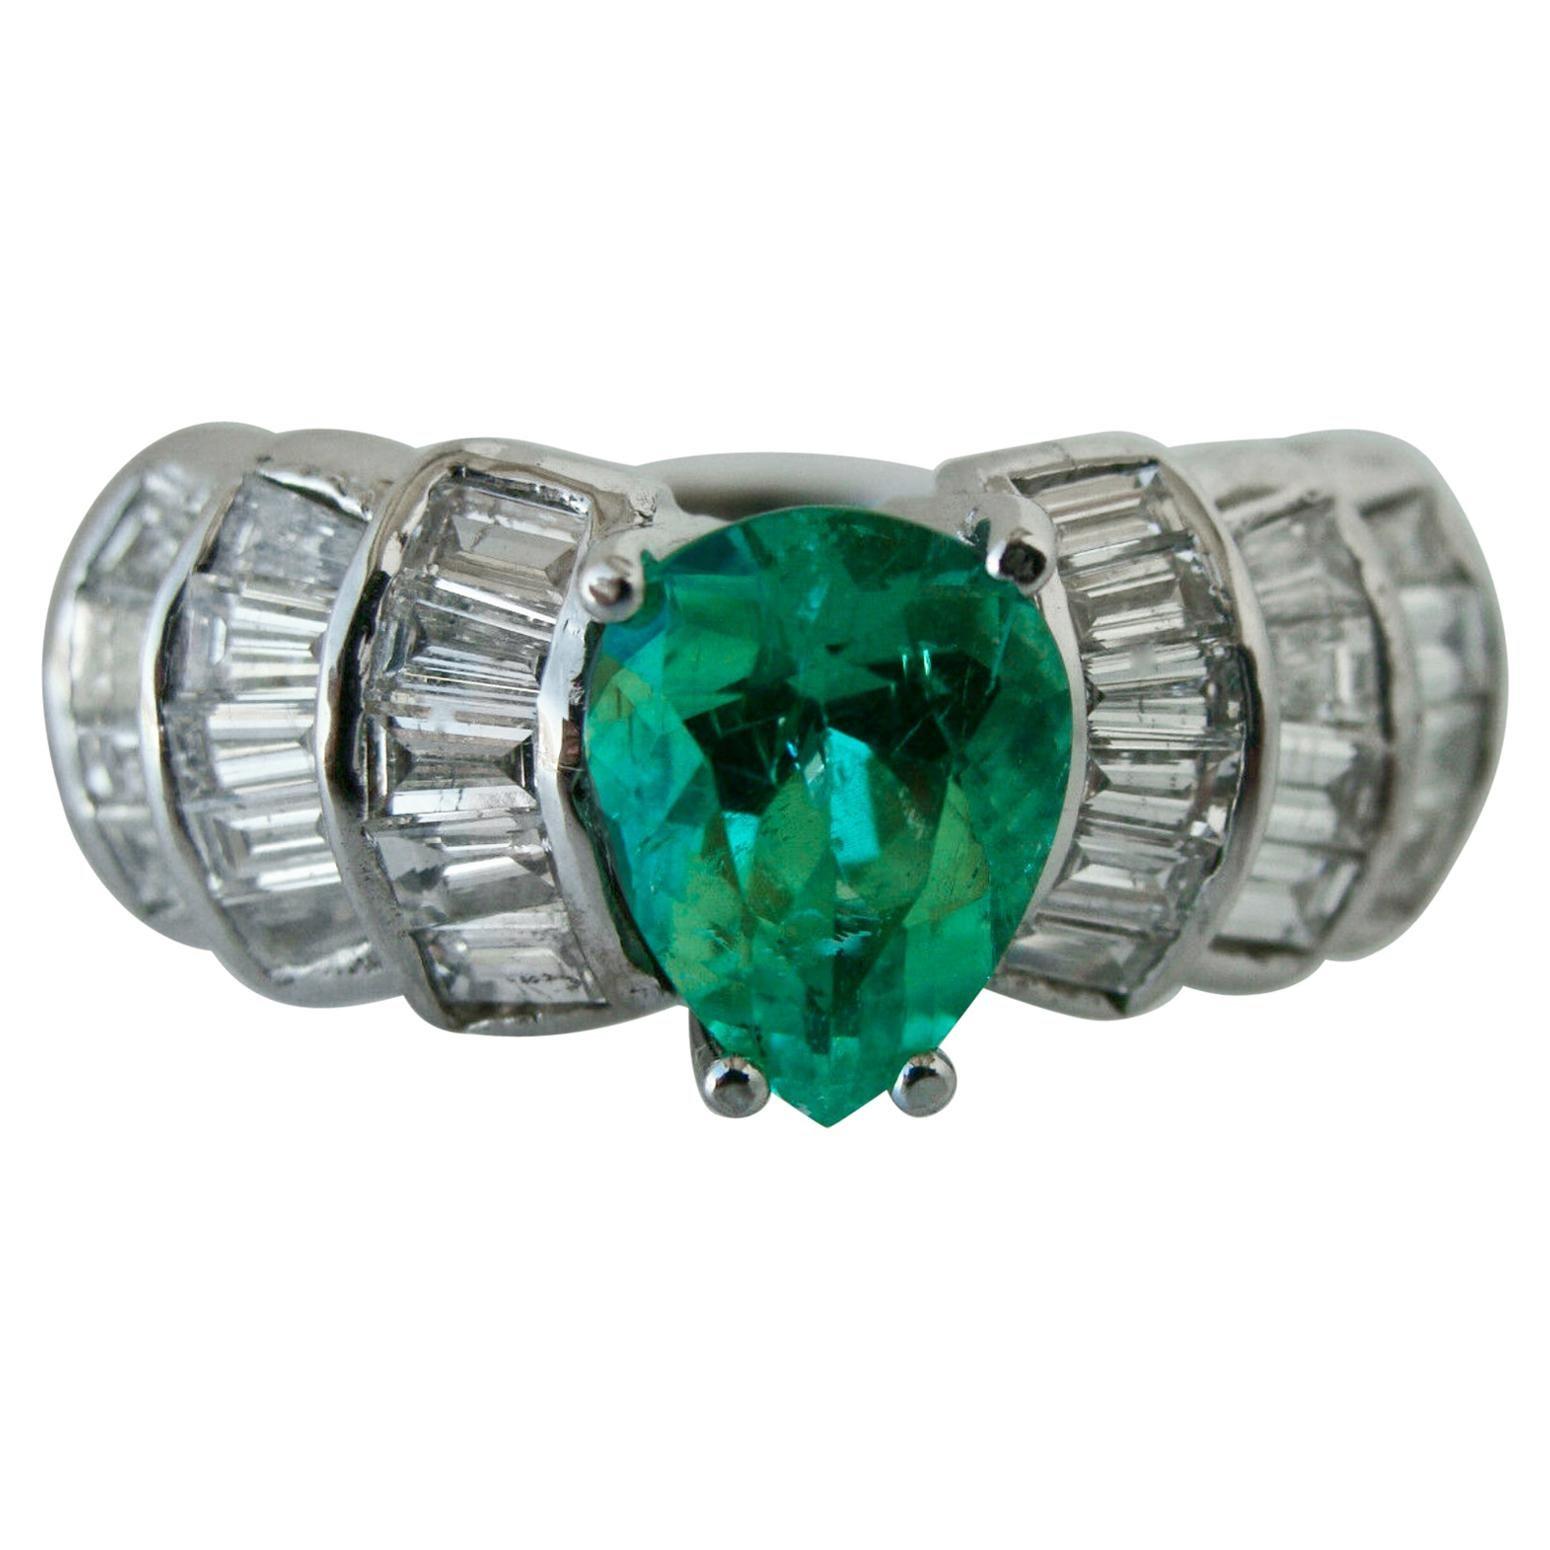 4.20 Carat Natural Colombian Emerald Diamond Estate Ring 14 Karat